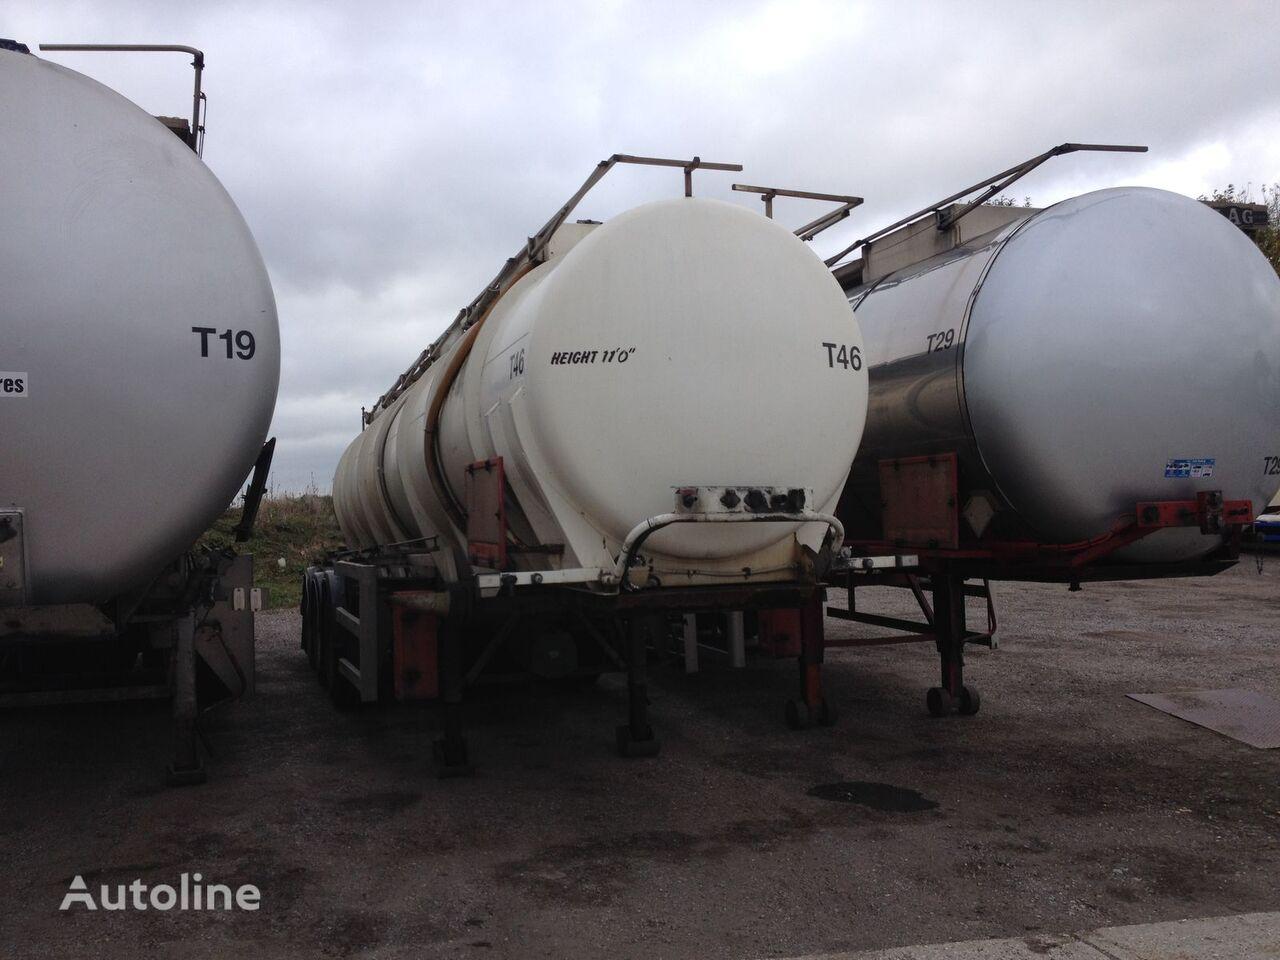 CRANE FRUEHAUF T46 cisterna química